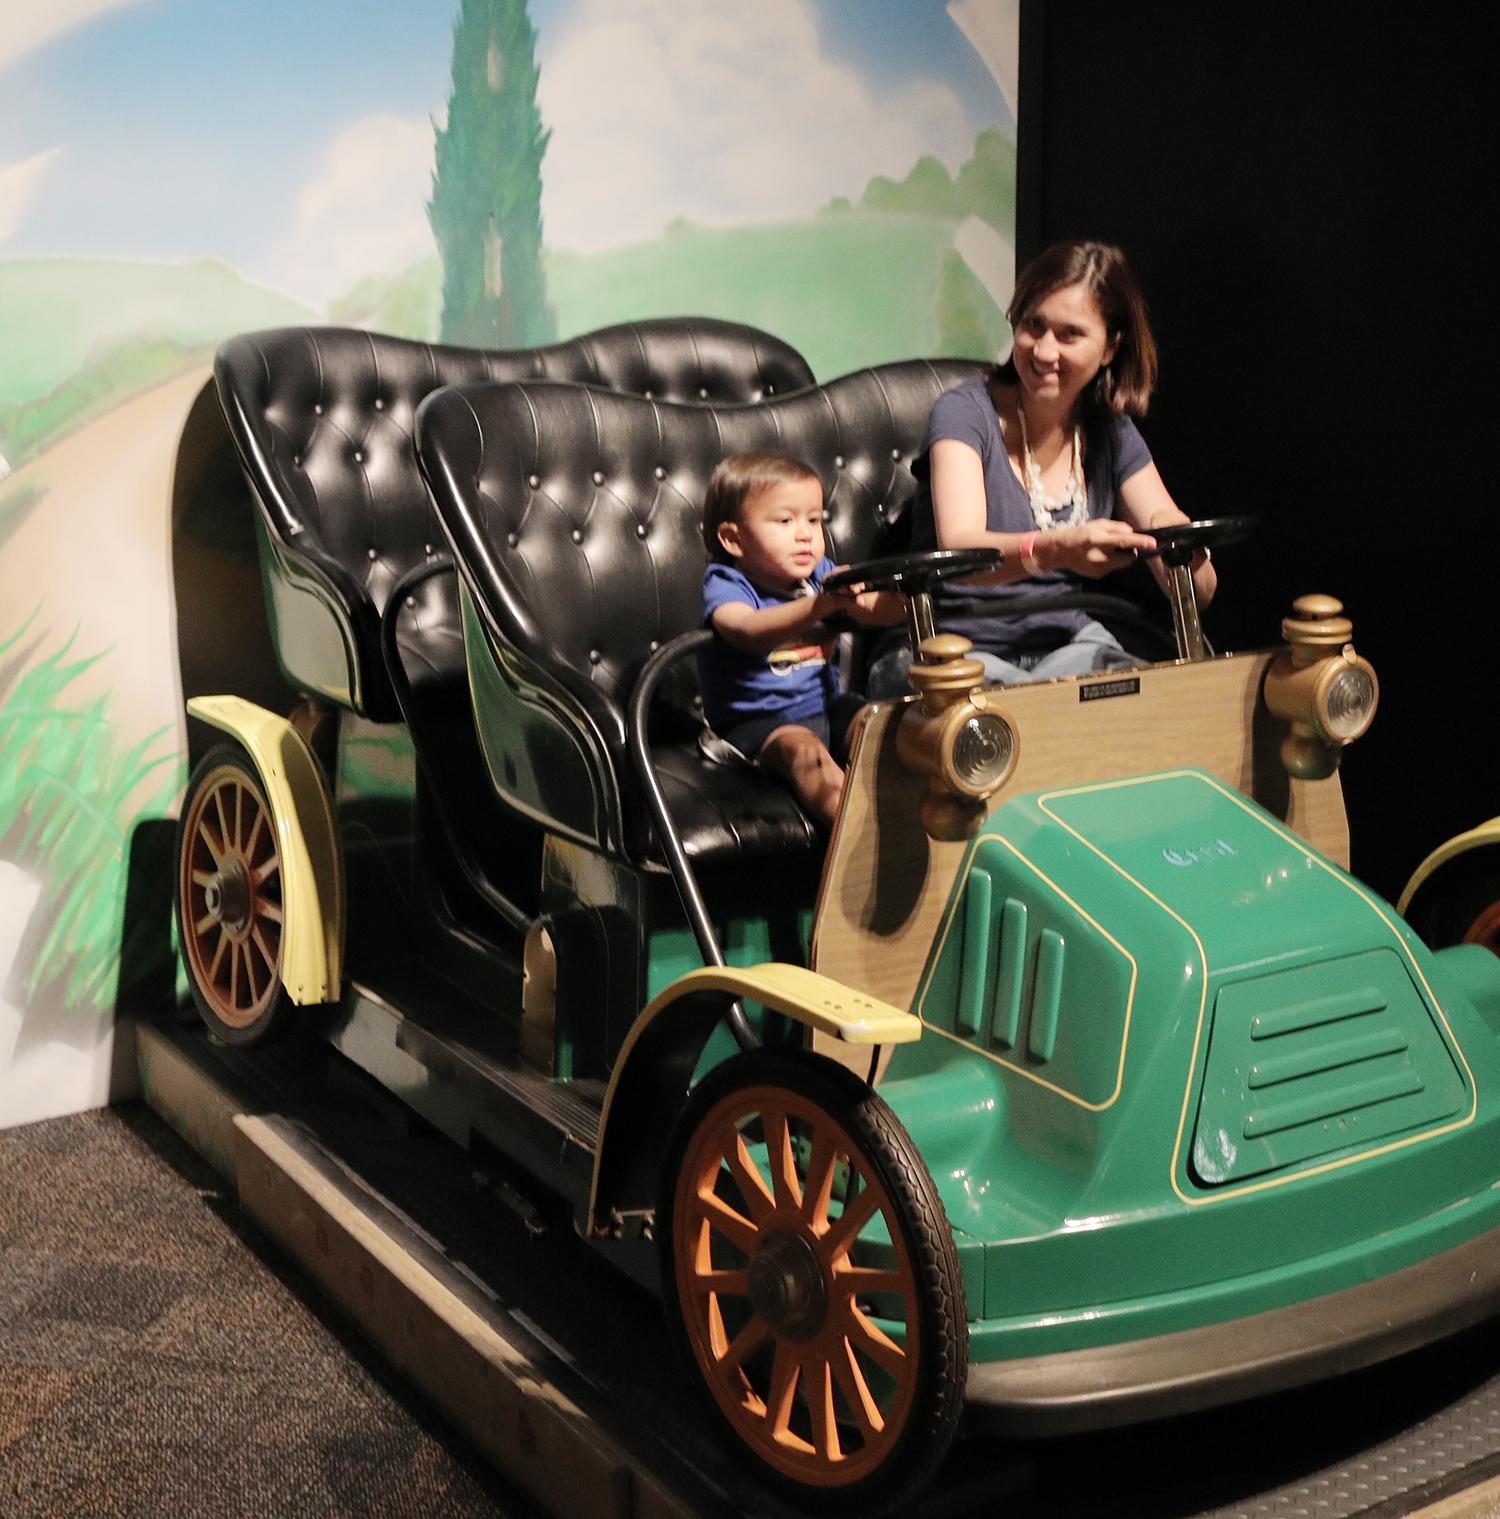 Magic Kingdom Toad Car Photo Op.jpg